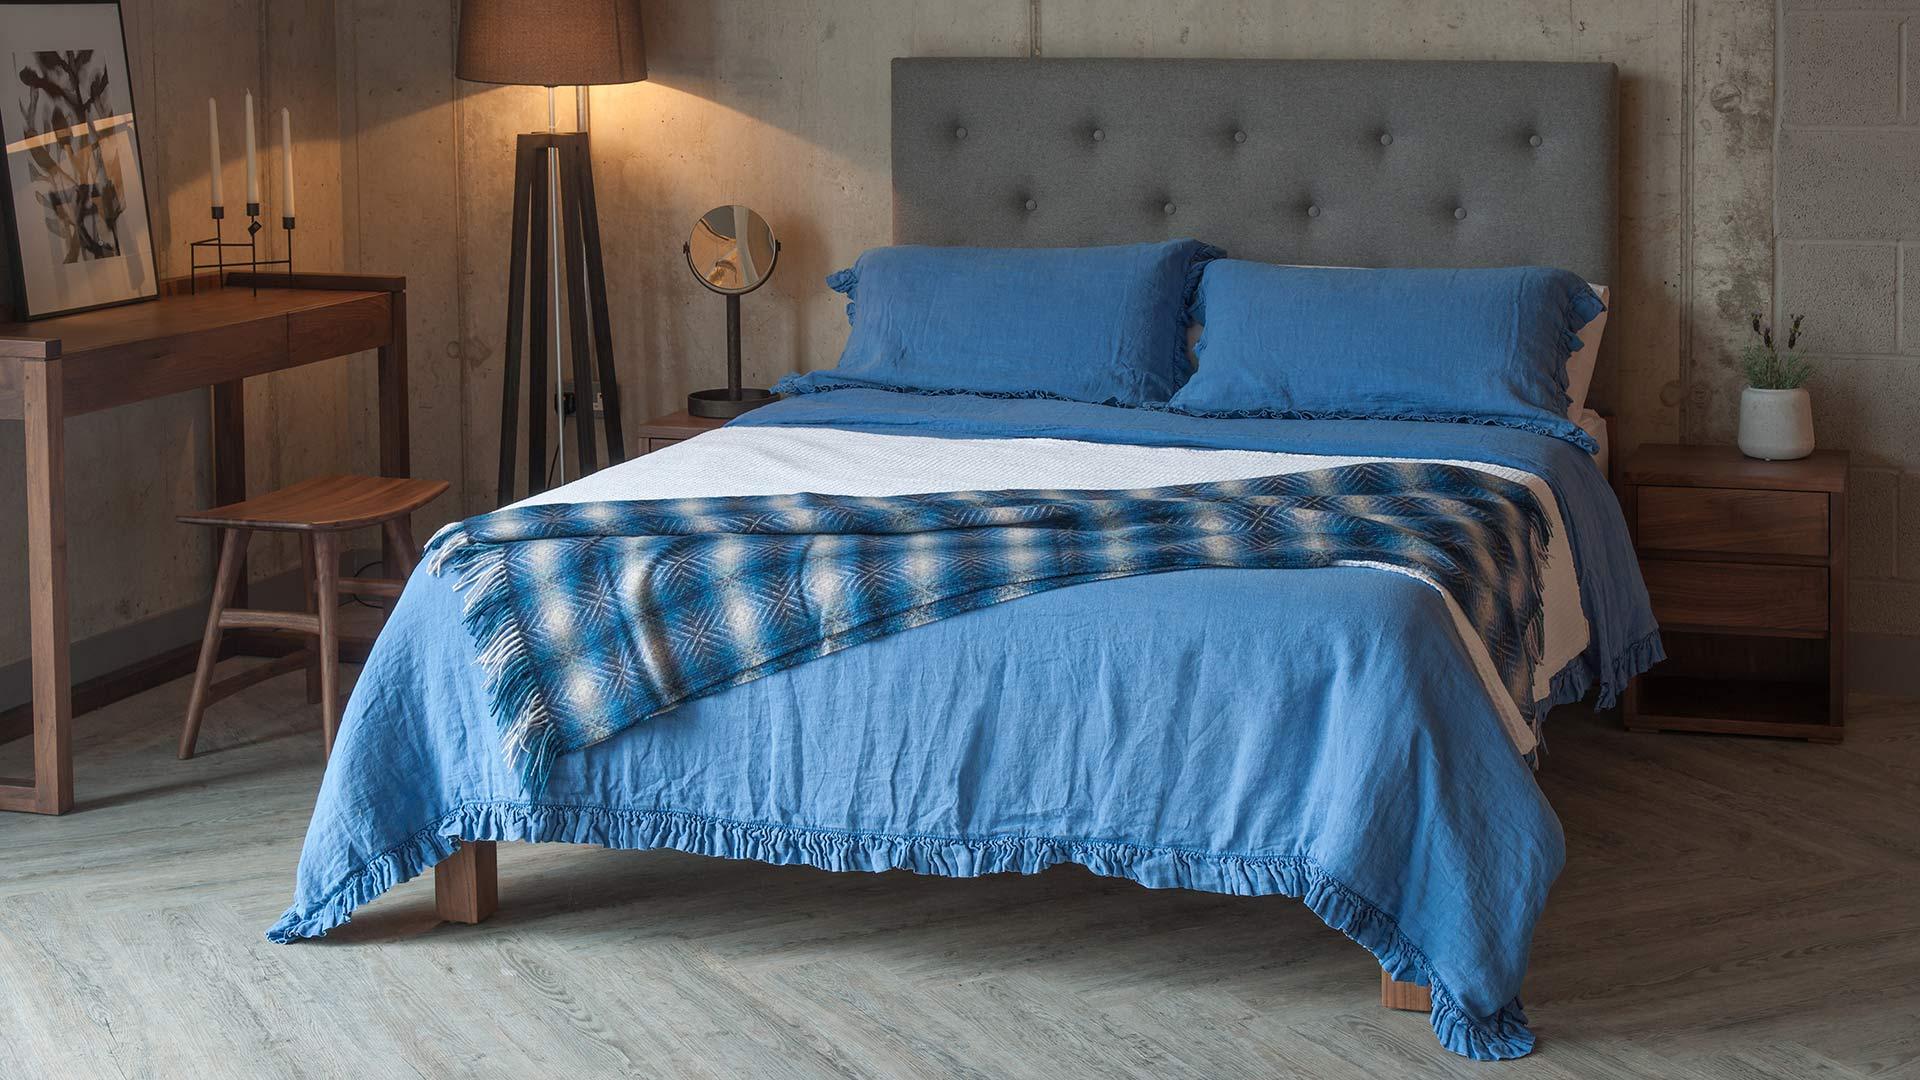 blue linen bedding on Skye bed